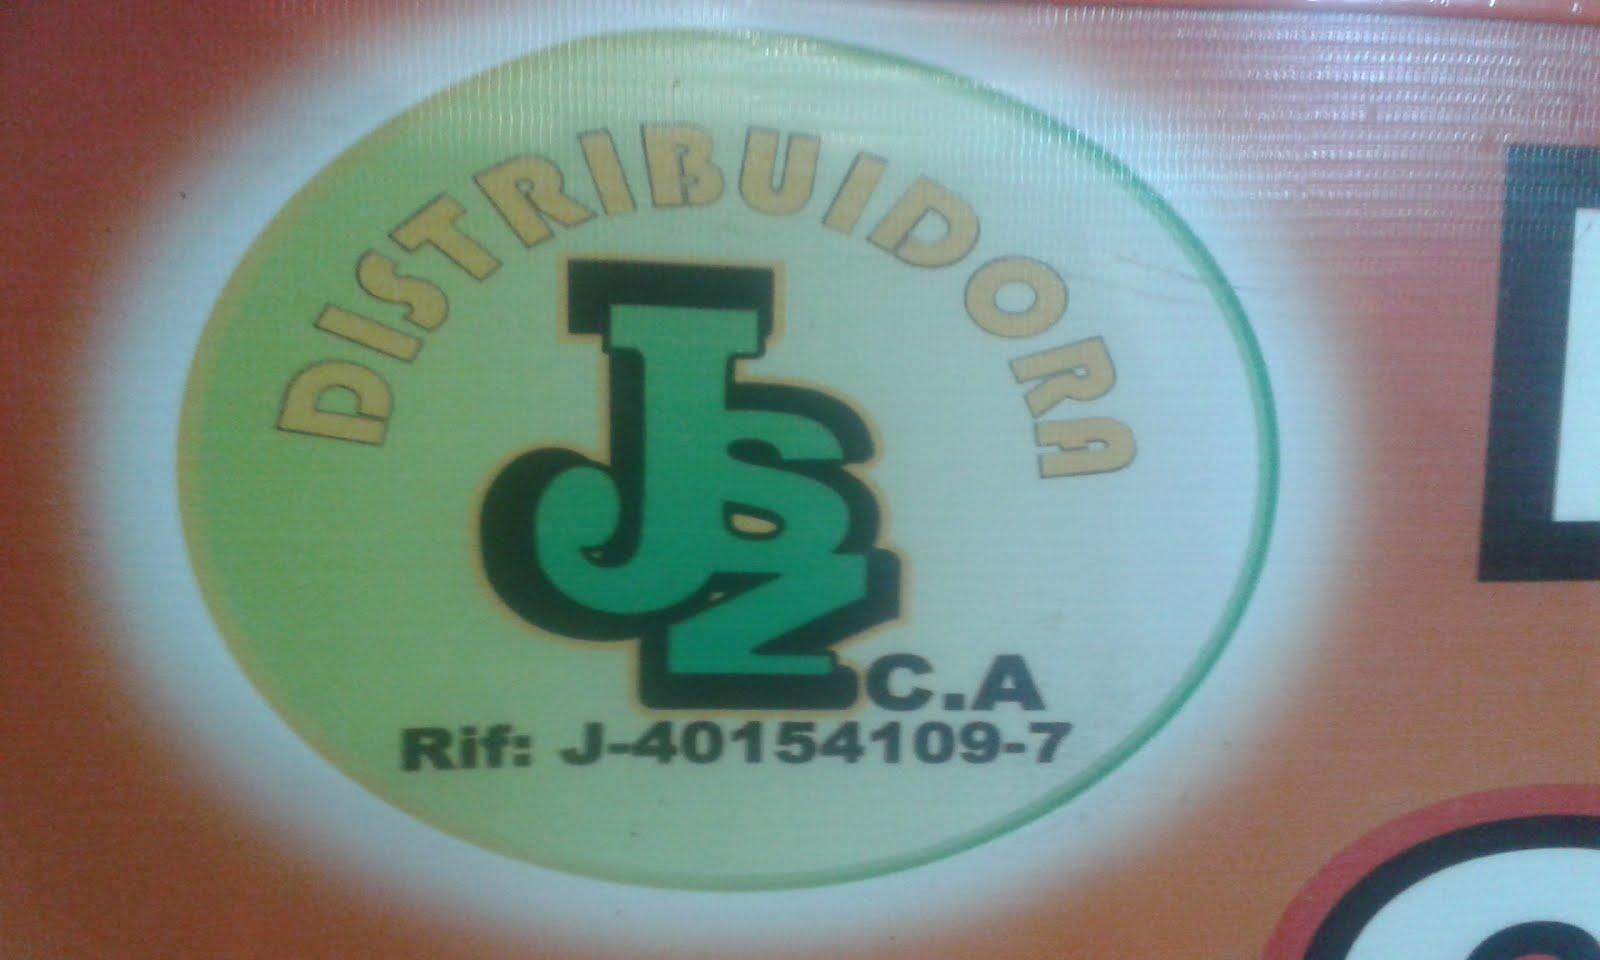 DISTRIBUIDORA JSZ C.A